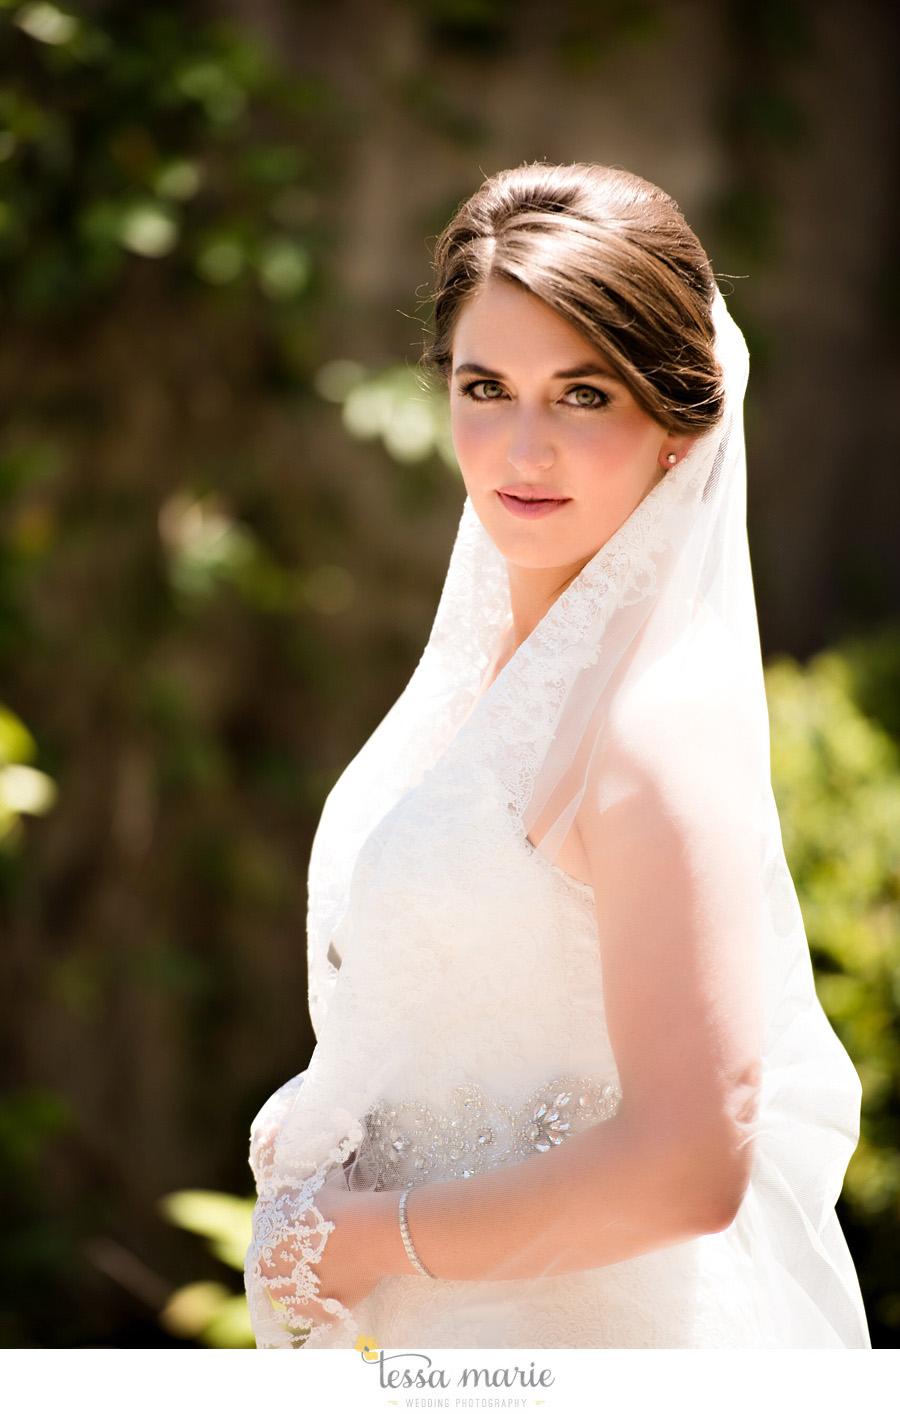 summerour_wedding_northside_united_methodist_church_wedding_tessa_marie_weddings_0037